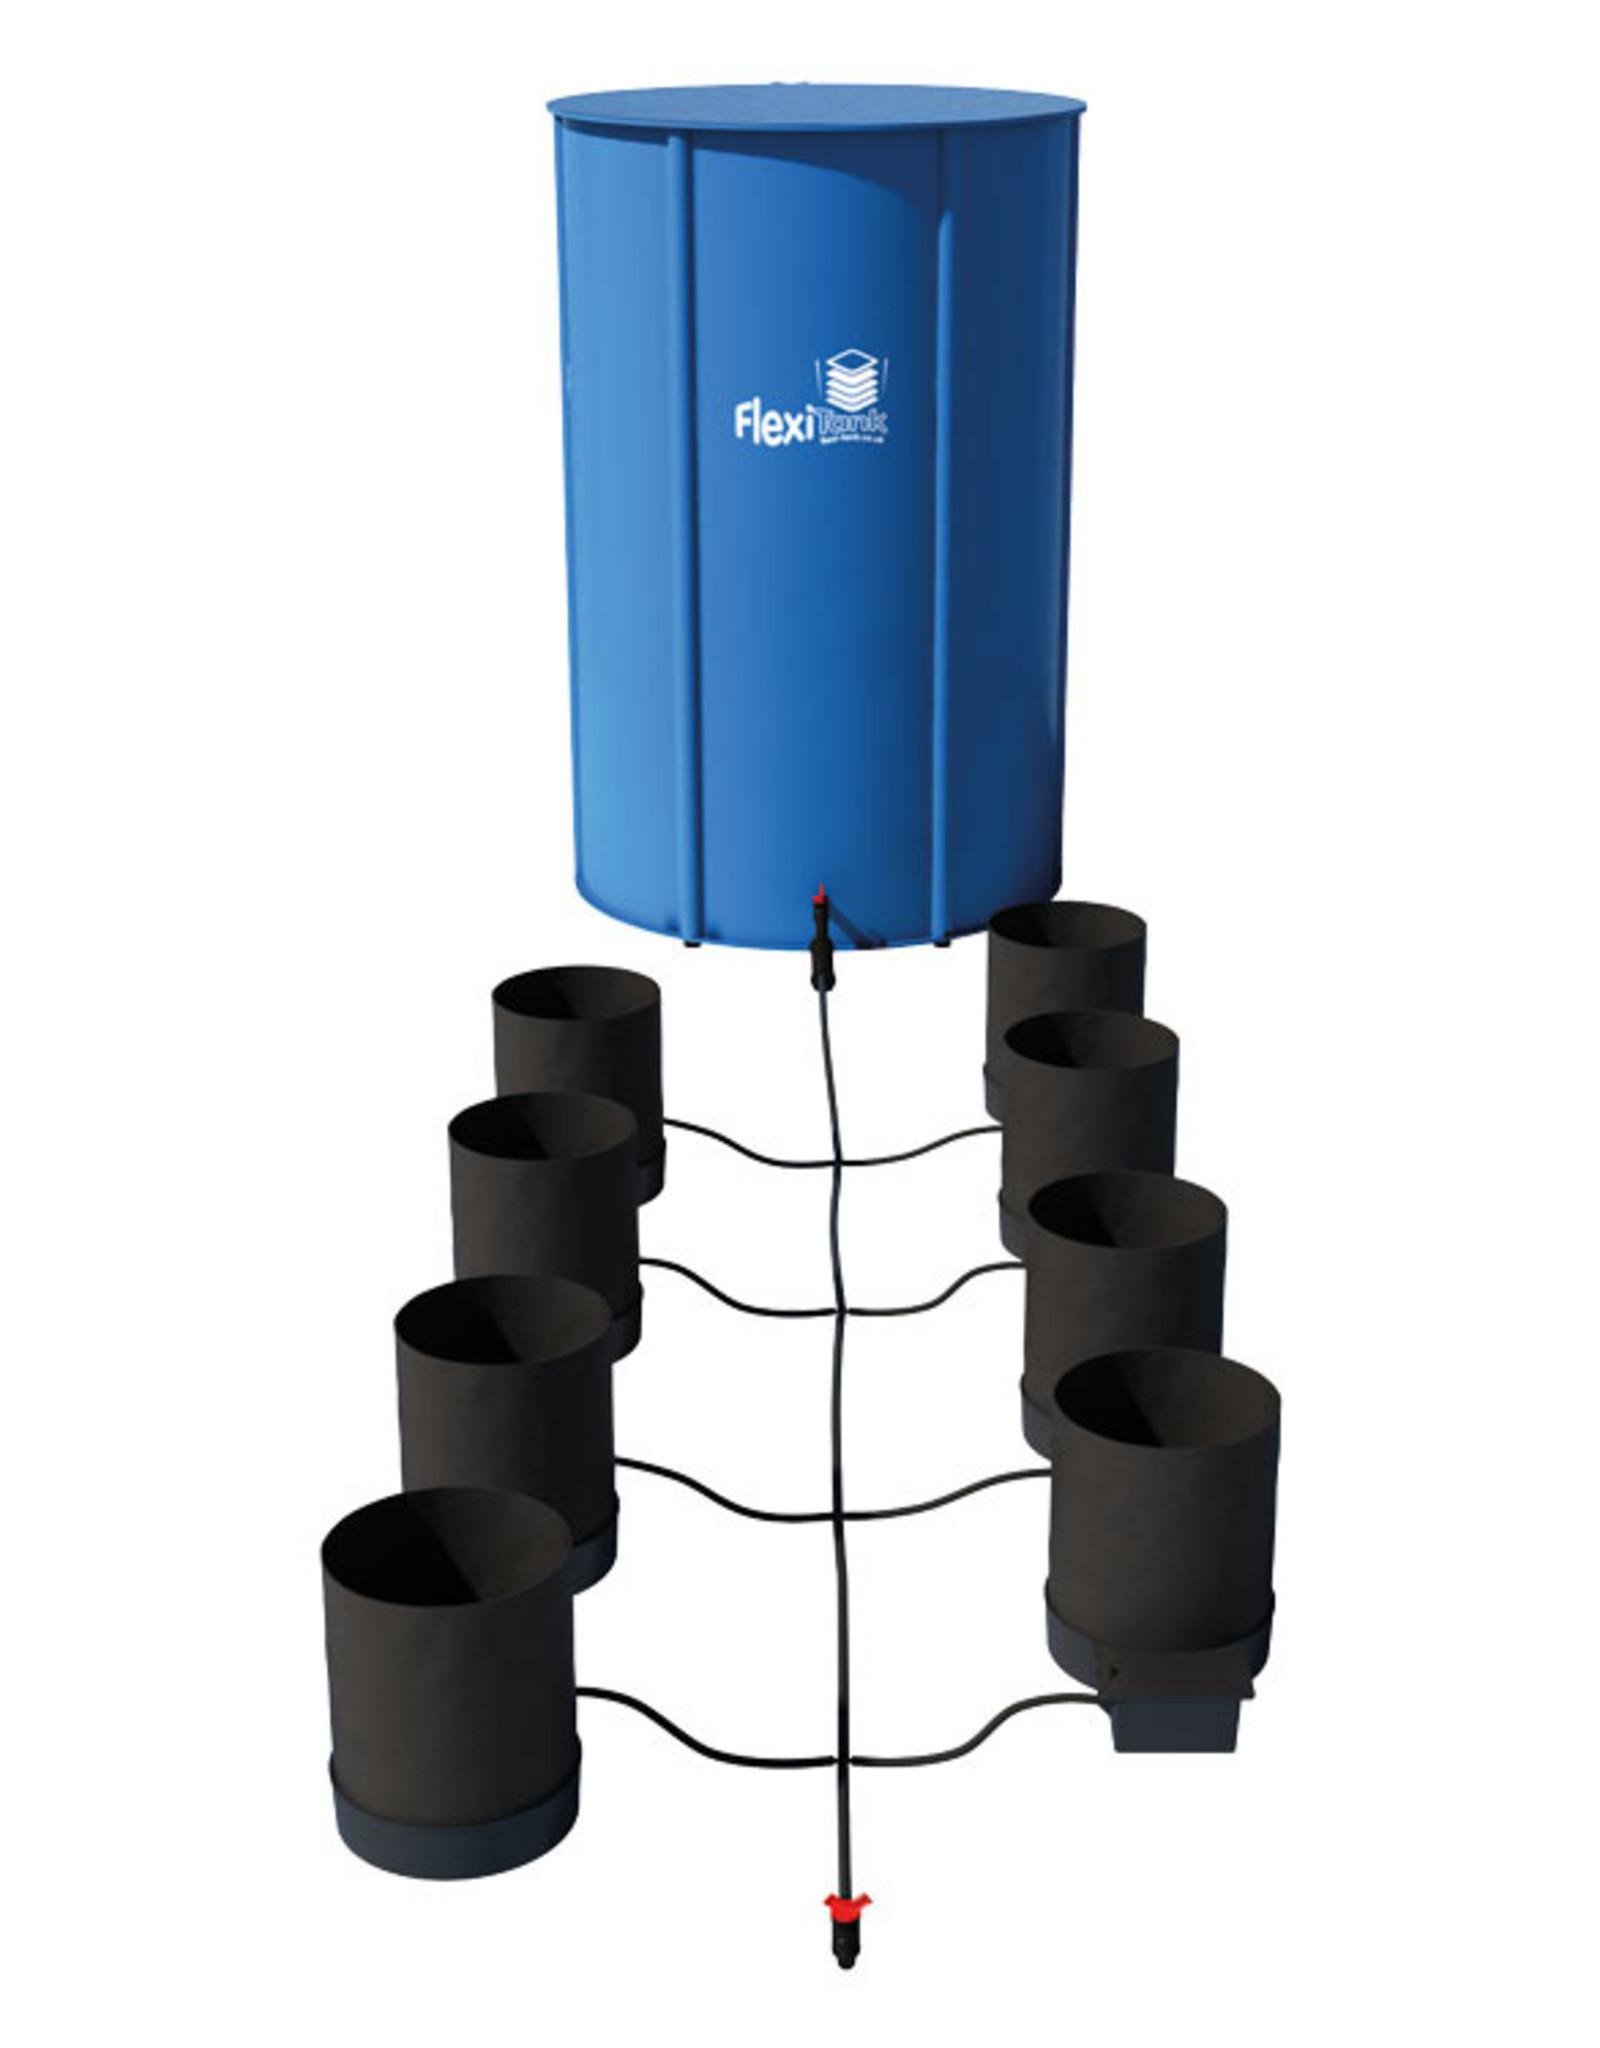 Autopot SmartPot 8 System